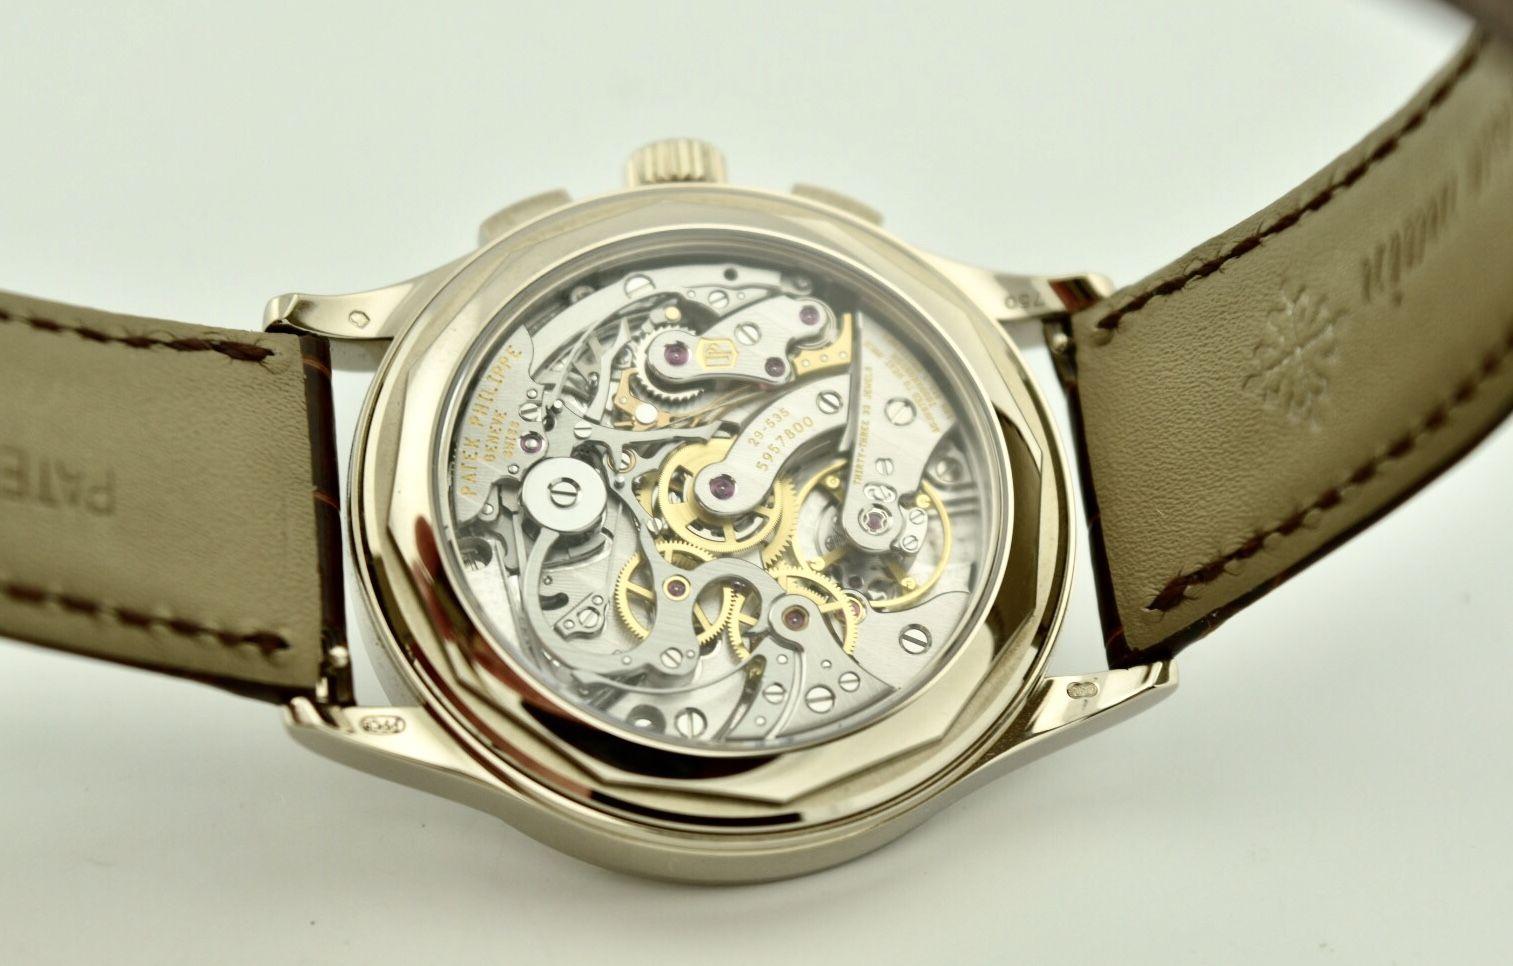 IMG 7578 - Patek Philippe Chronograph